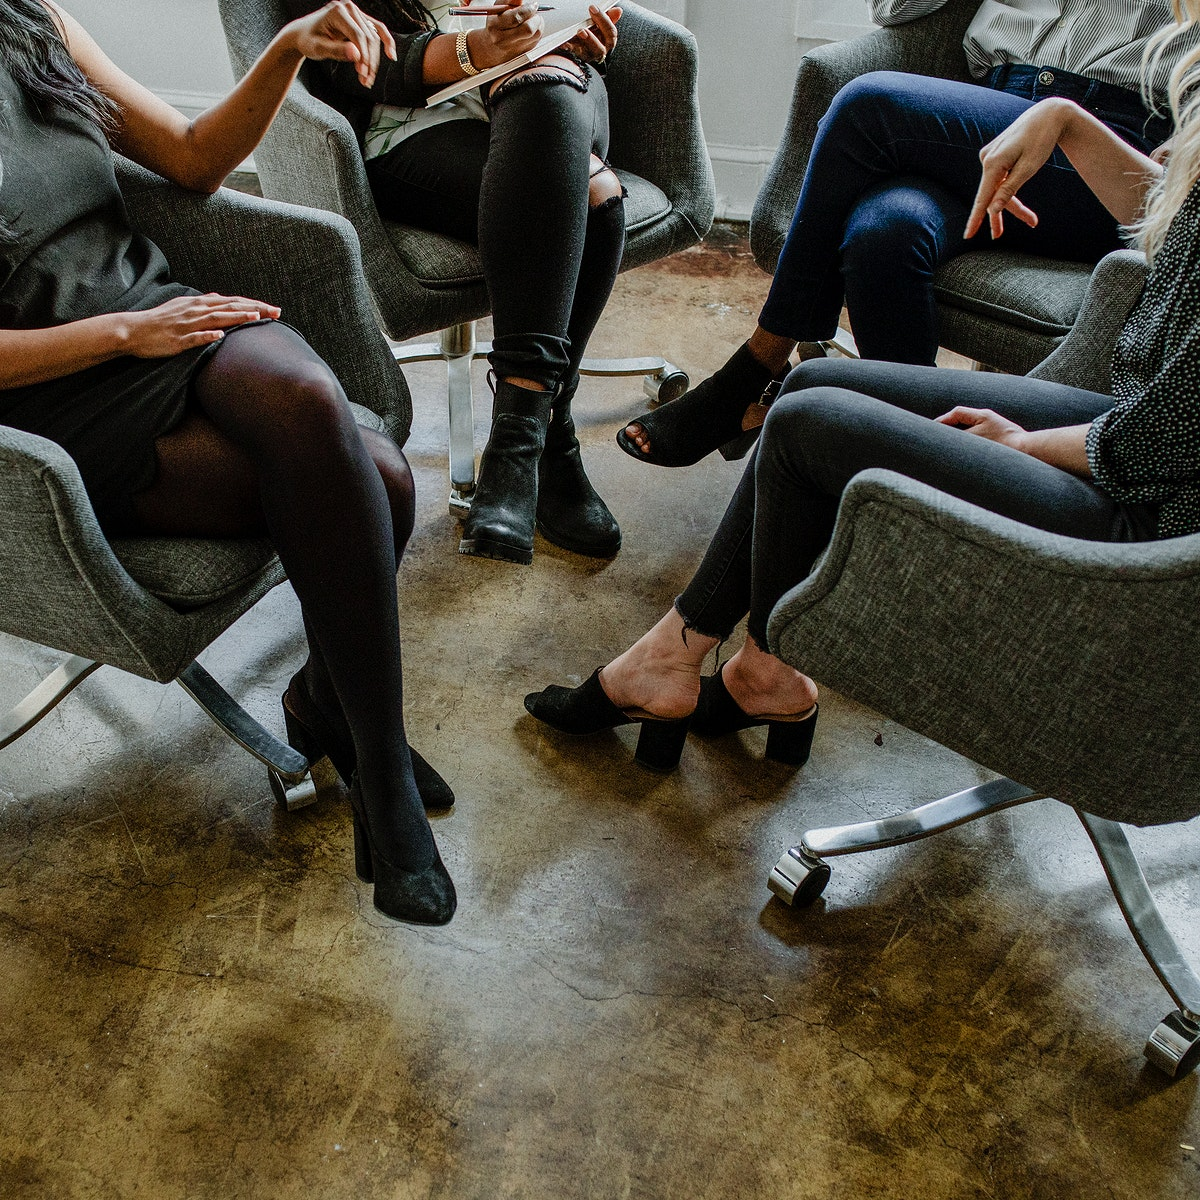 Businesswomen brainstorming in the office